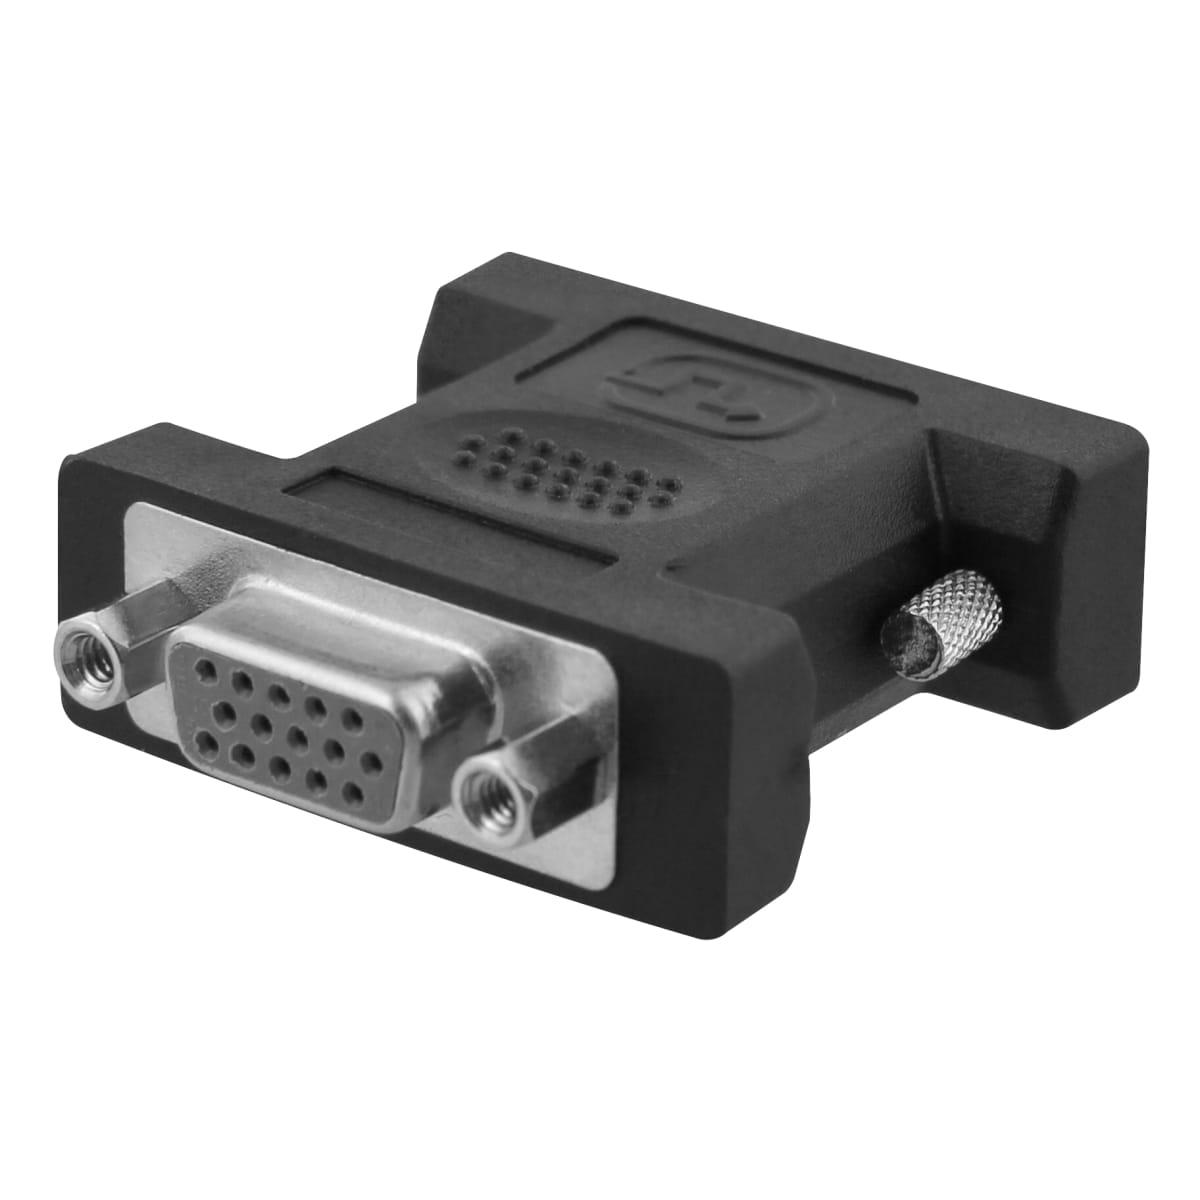 Male DVI / female VGA adapter